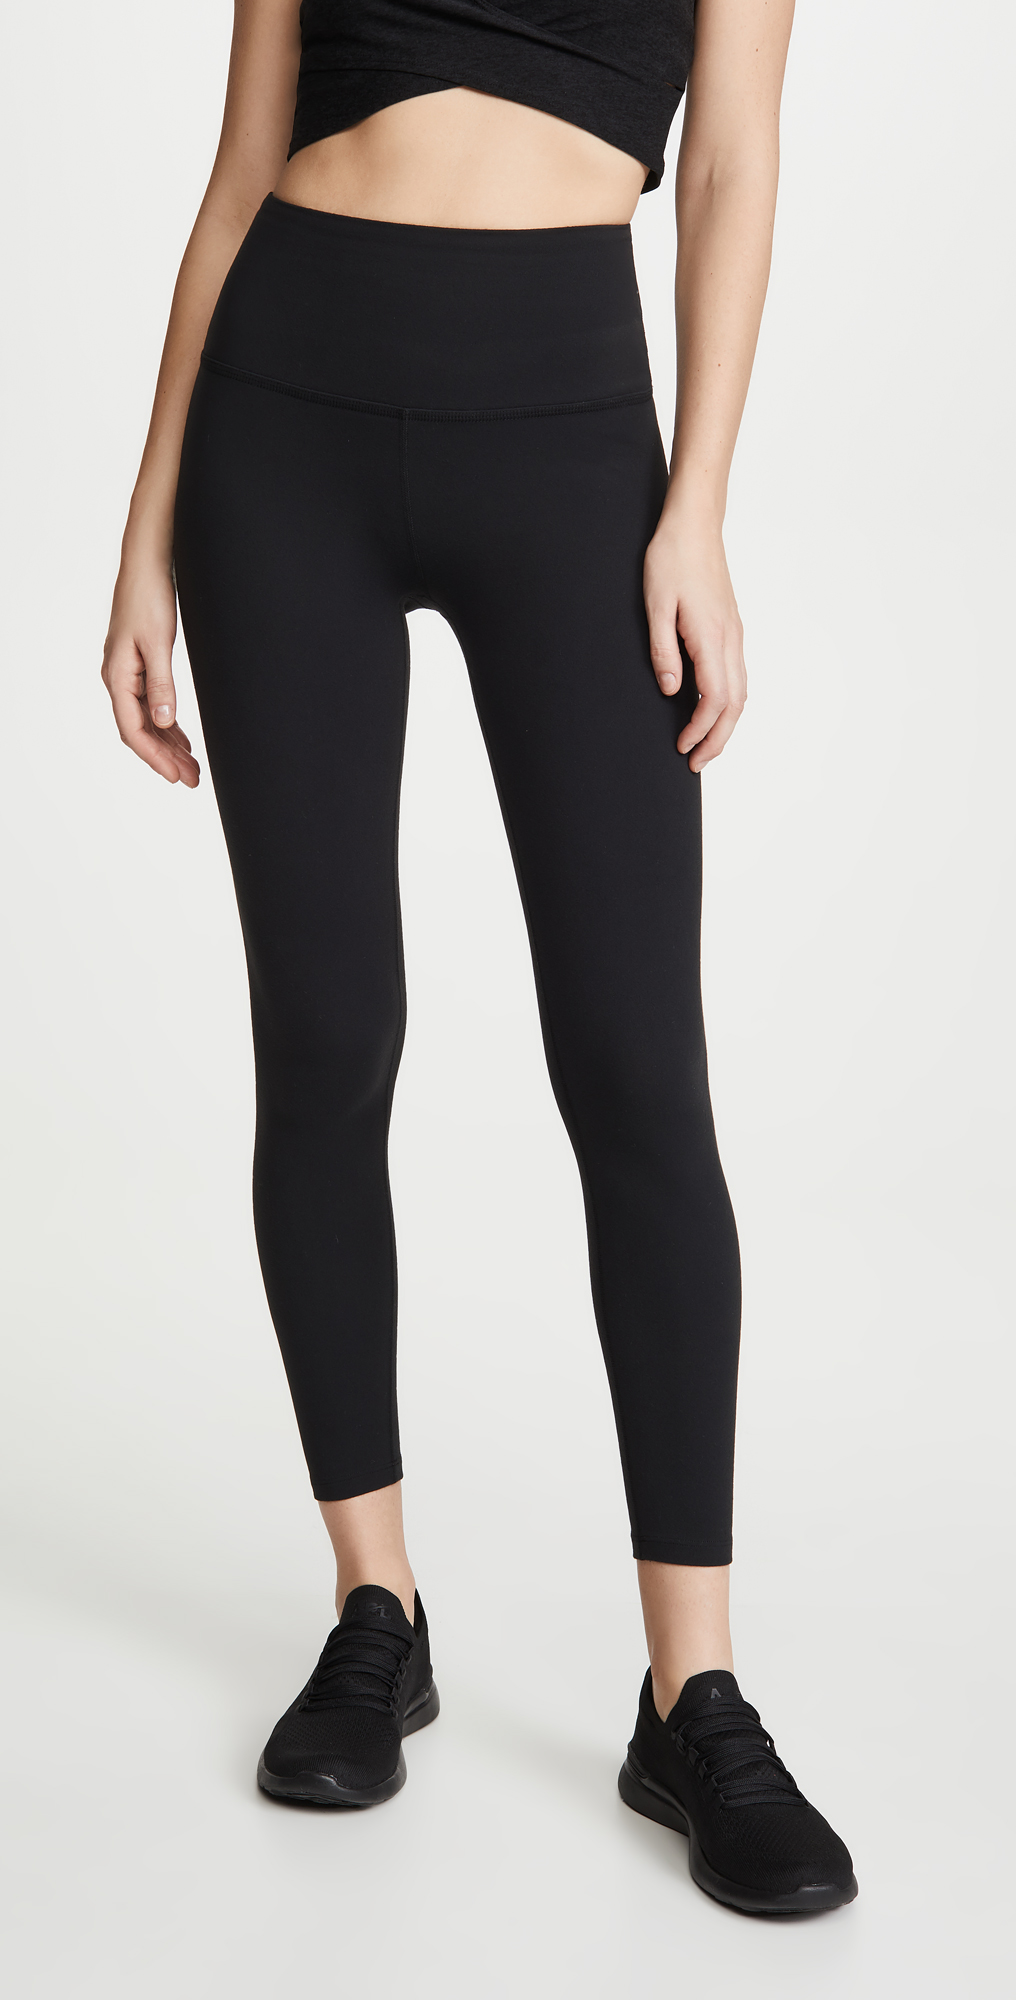 Beyond Yoga Brand-Pearlized High Waisted Midi Legging  NEW #52